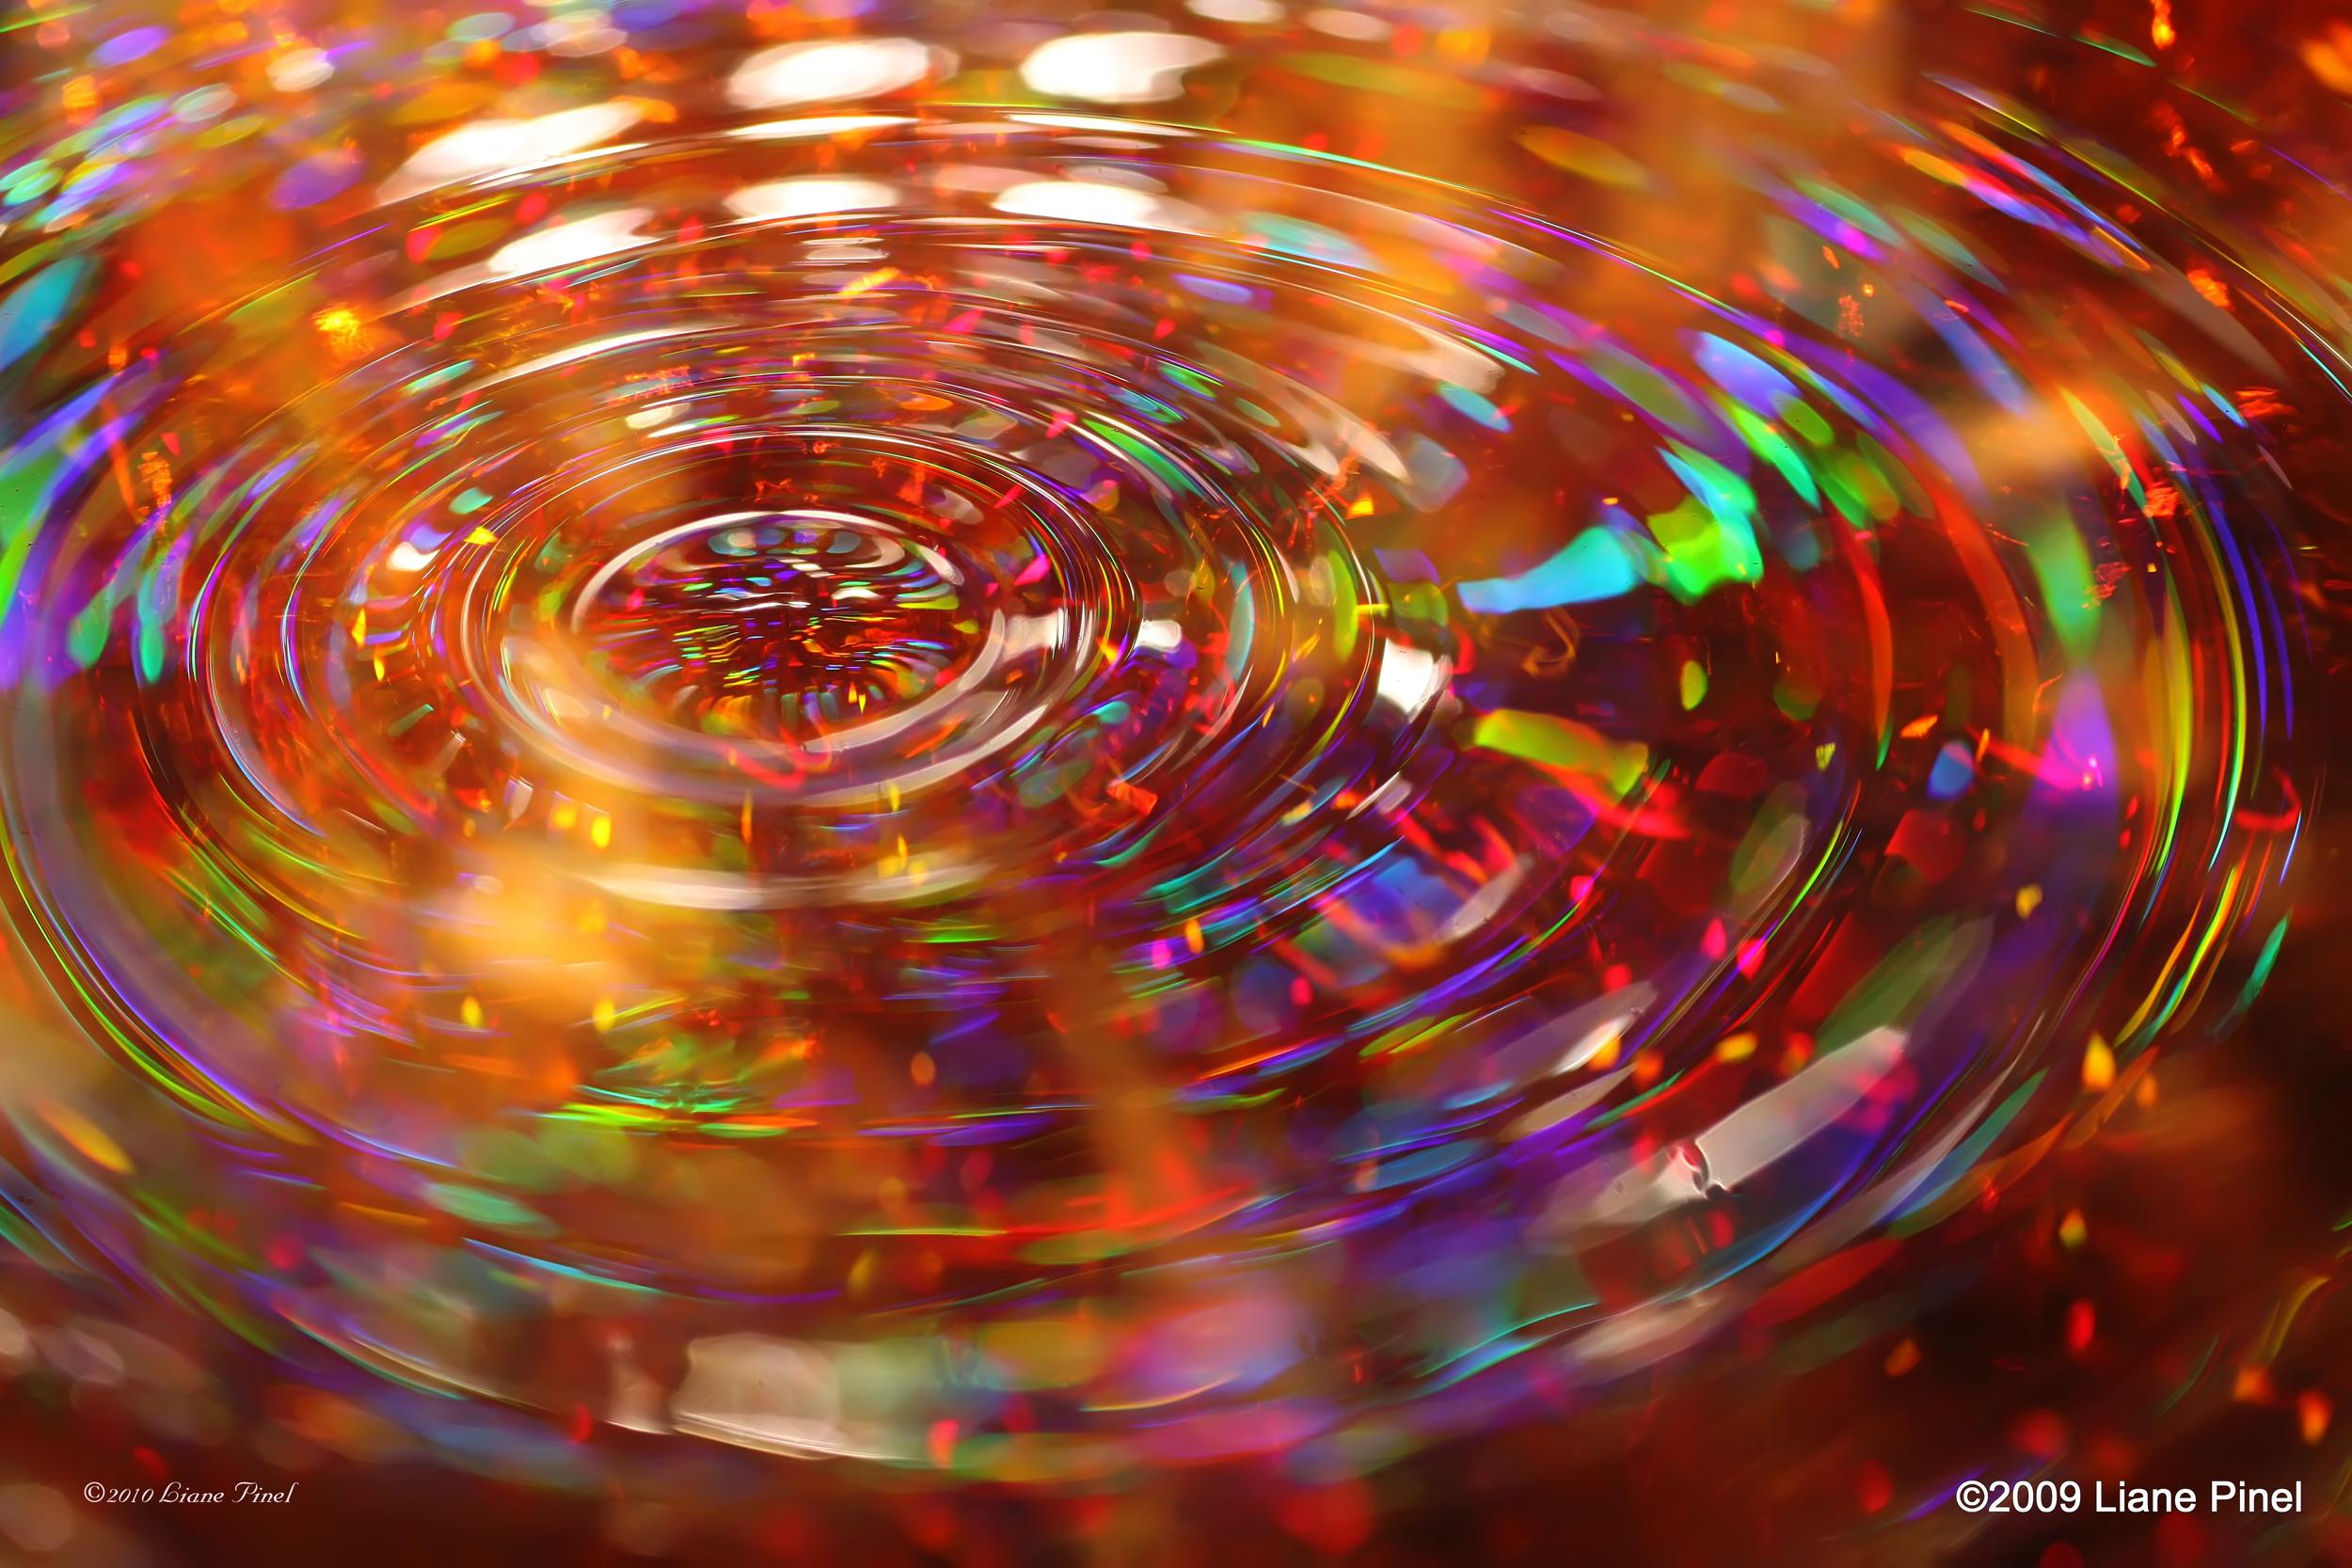 Kaleidoscope Wallpaper Live For Pc Wallpapersafari HD Wallpapers Download Free Images Wallpaper [1000image.com]